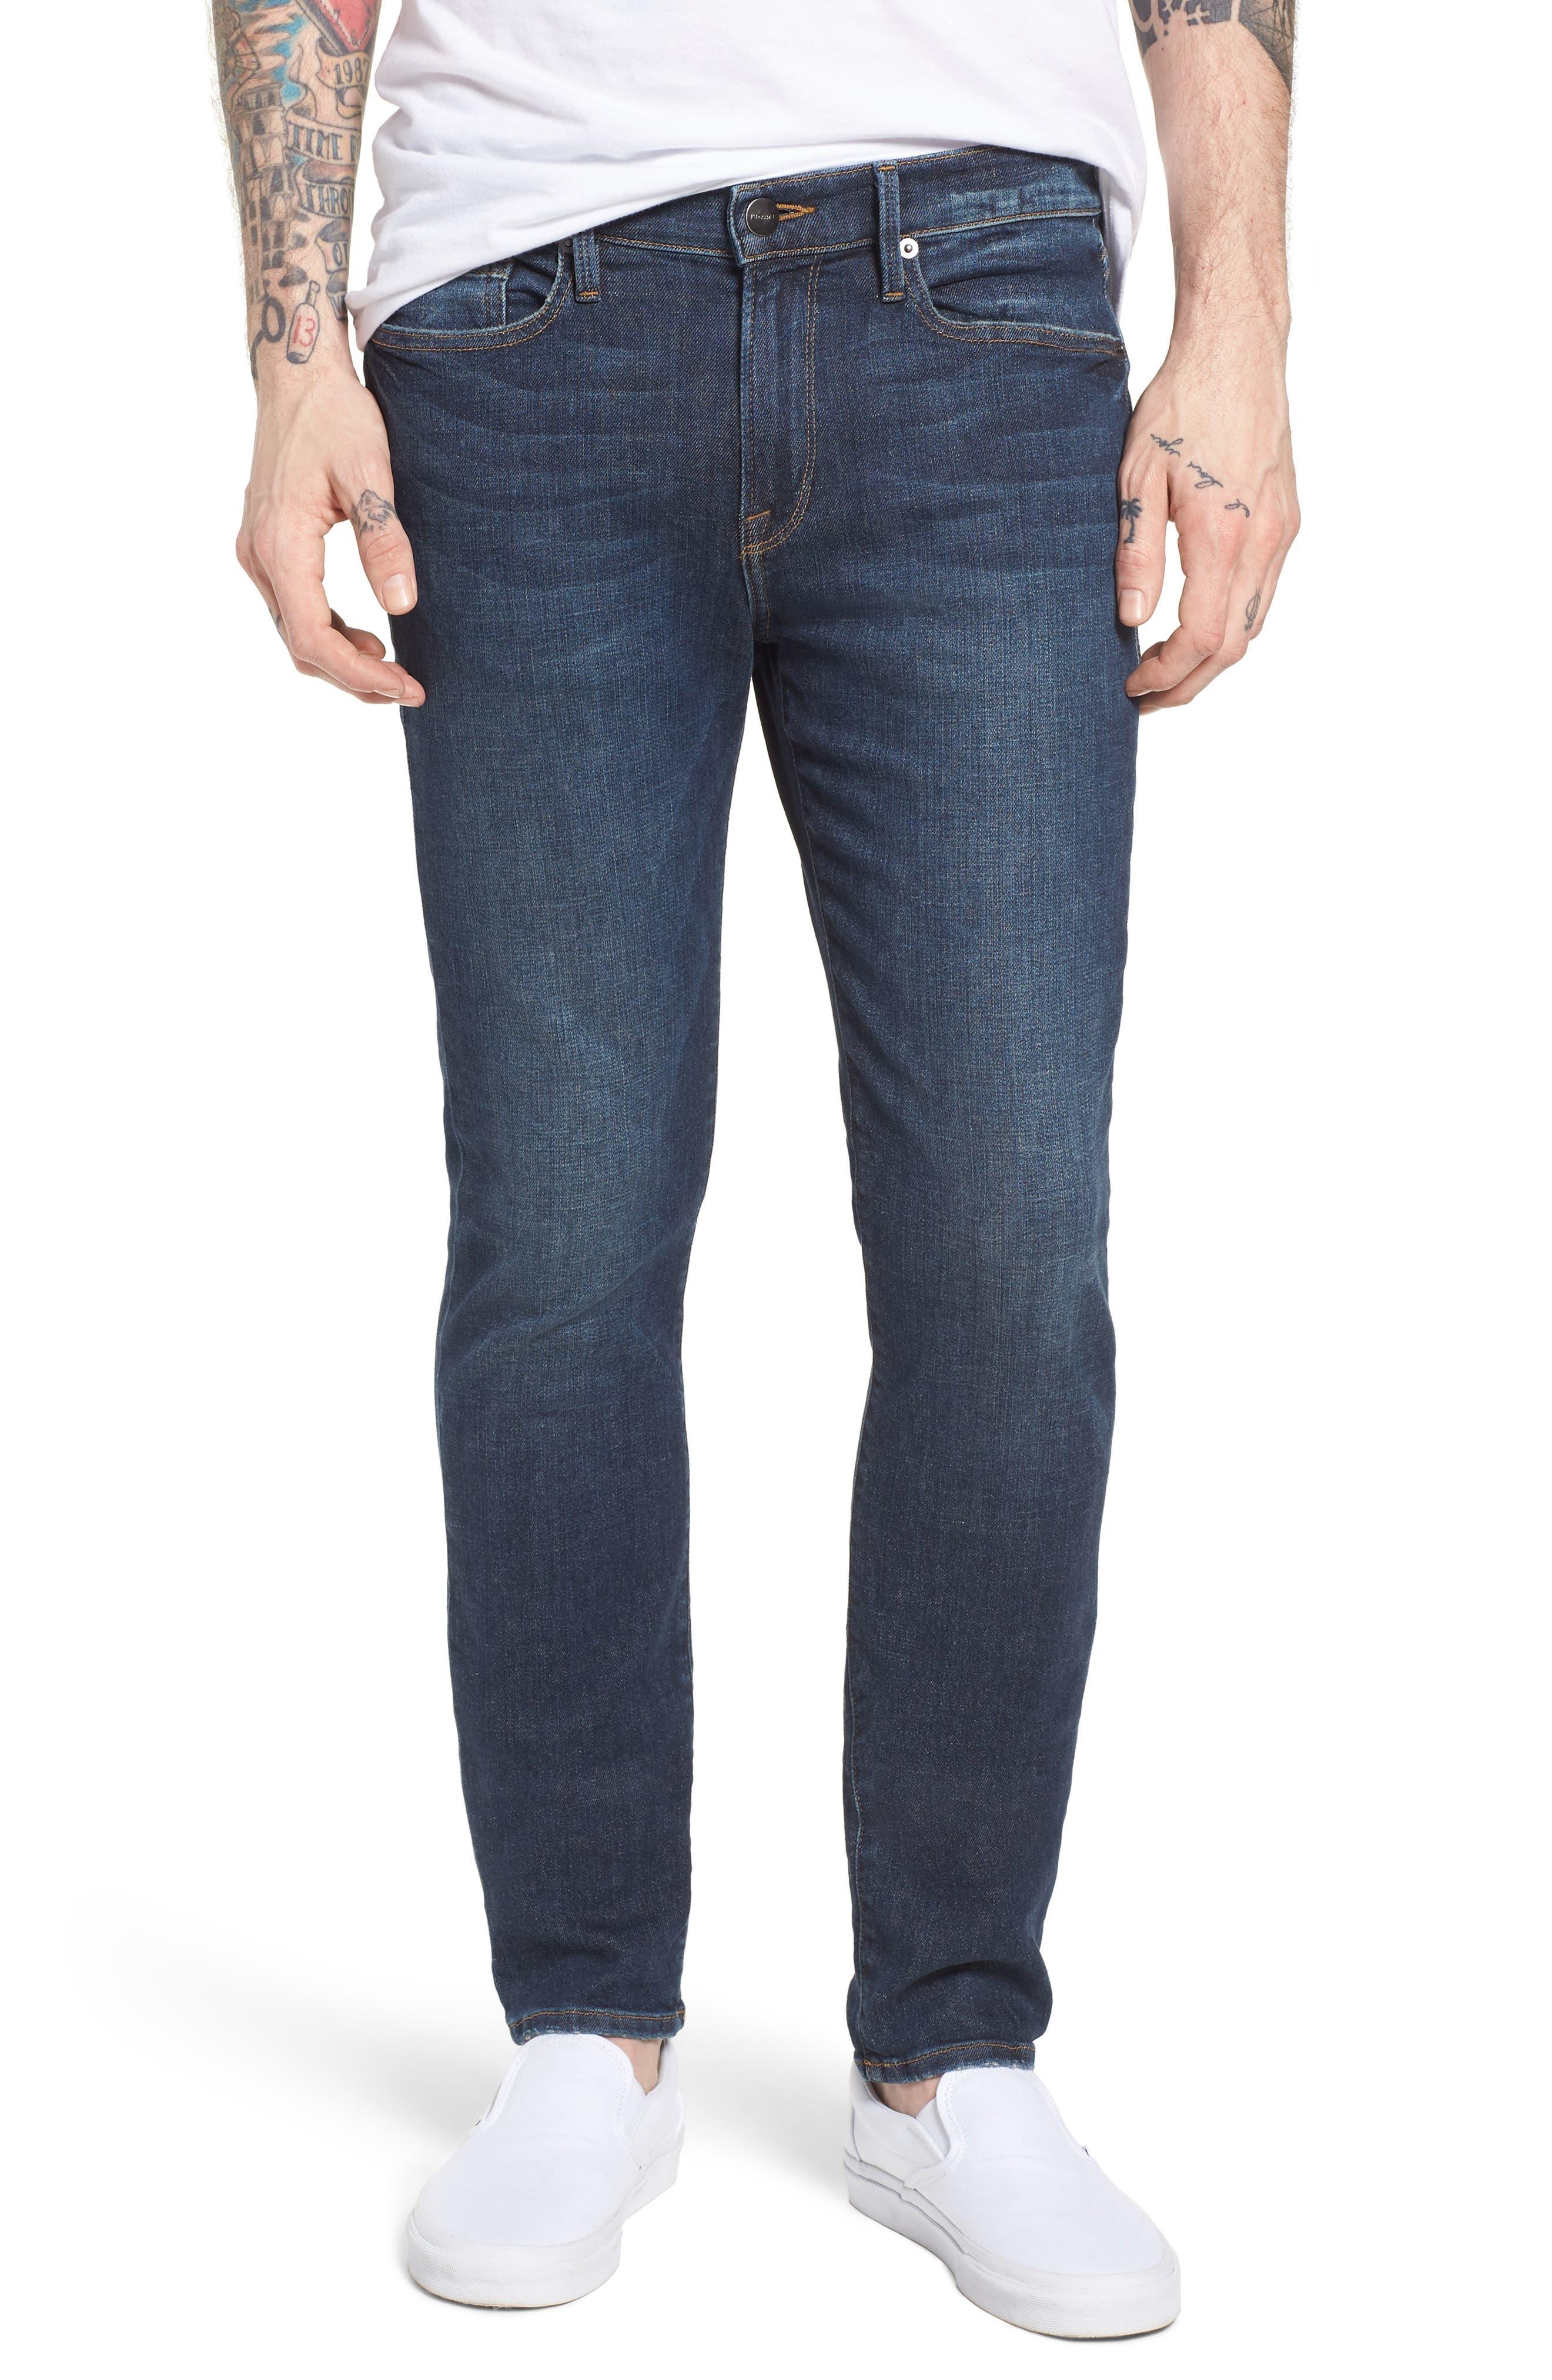 L'Homme Skinny Jeans,                             Main thumbnail 1, color,                             Loris